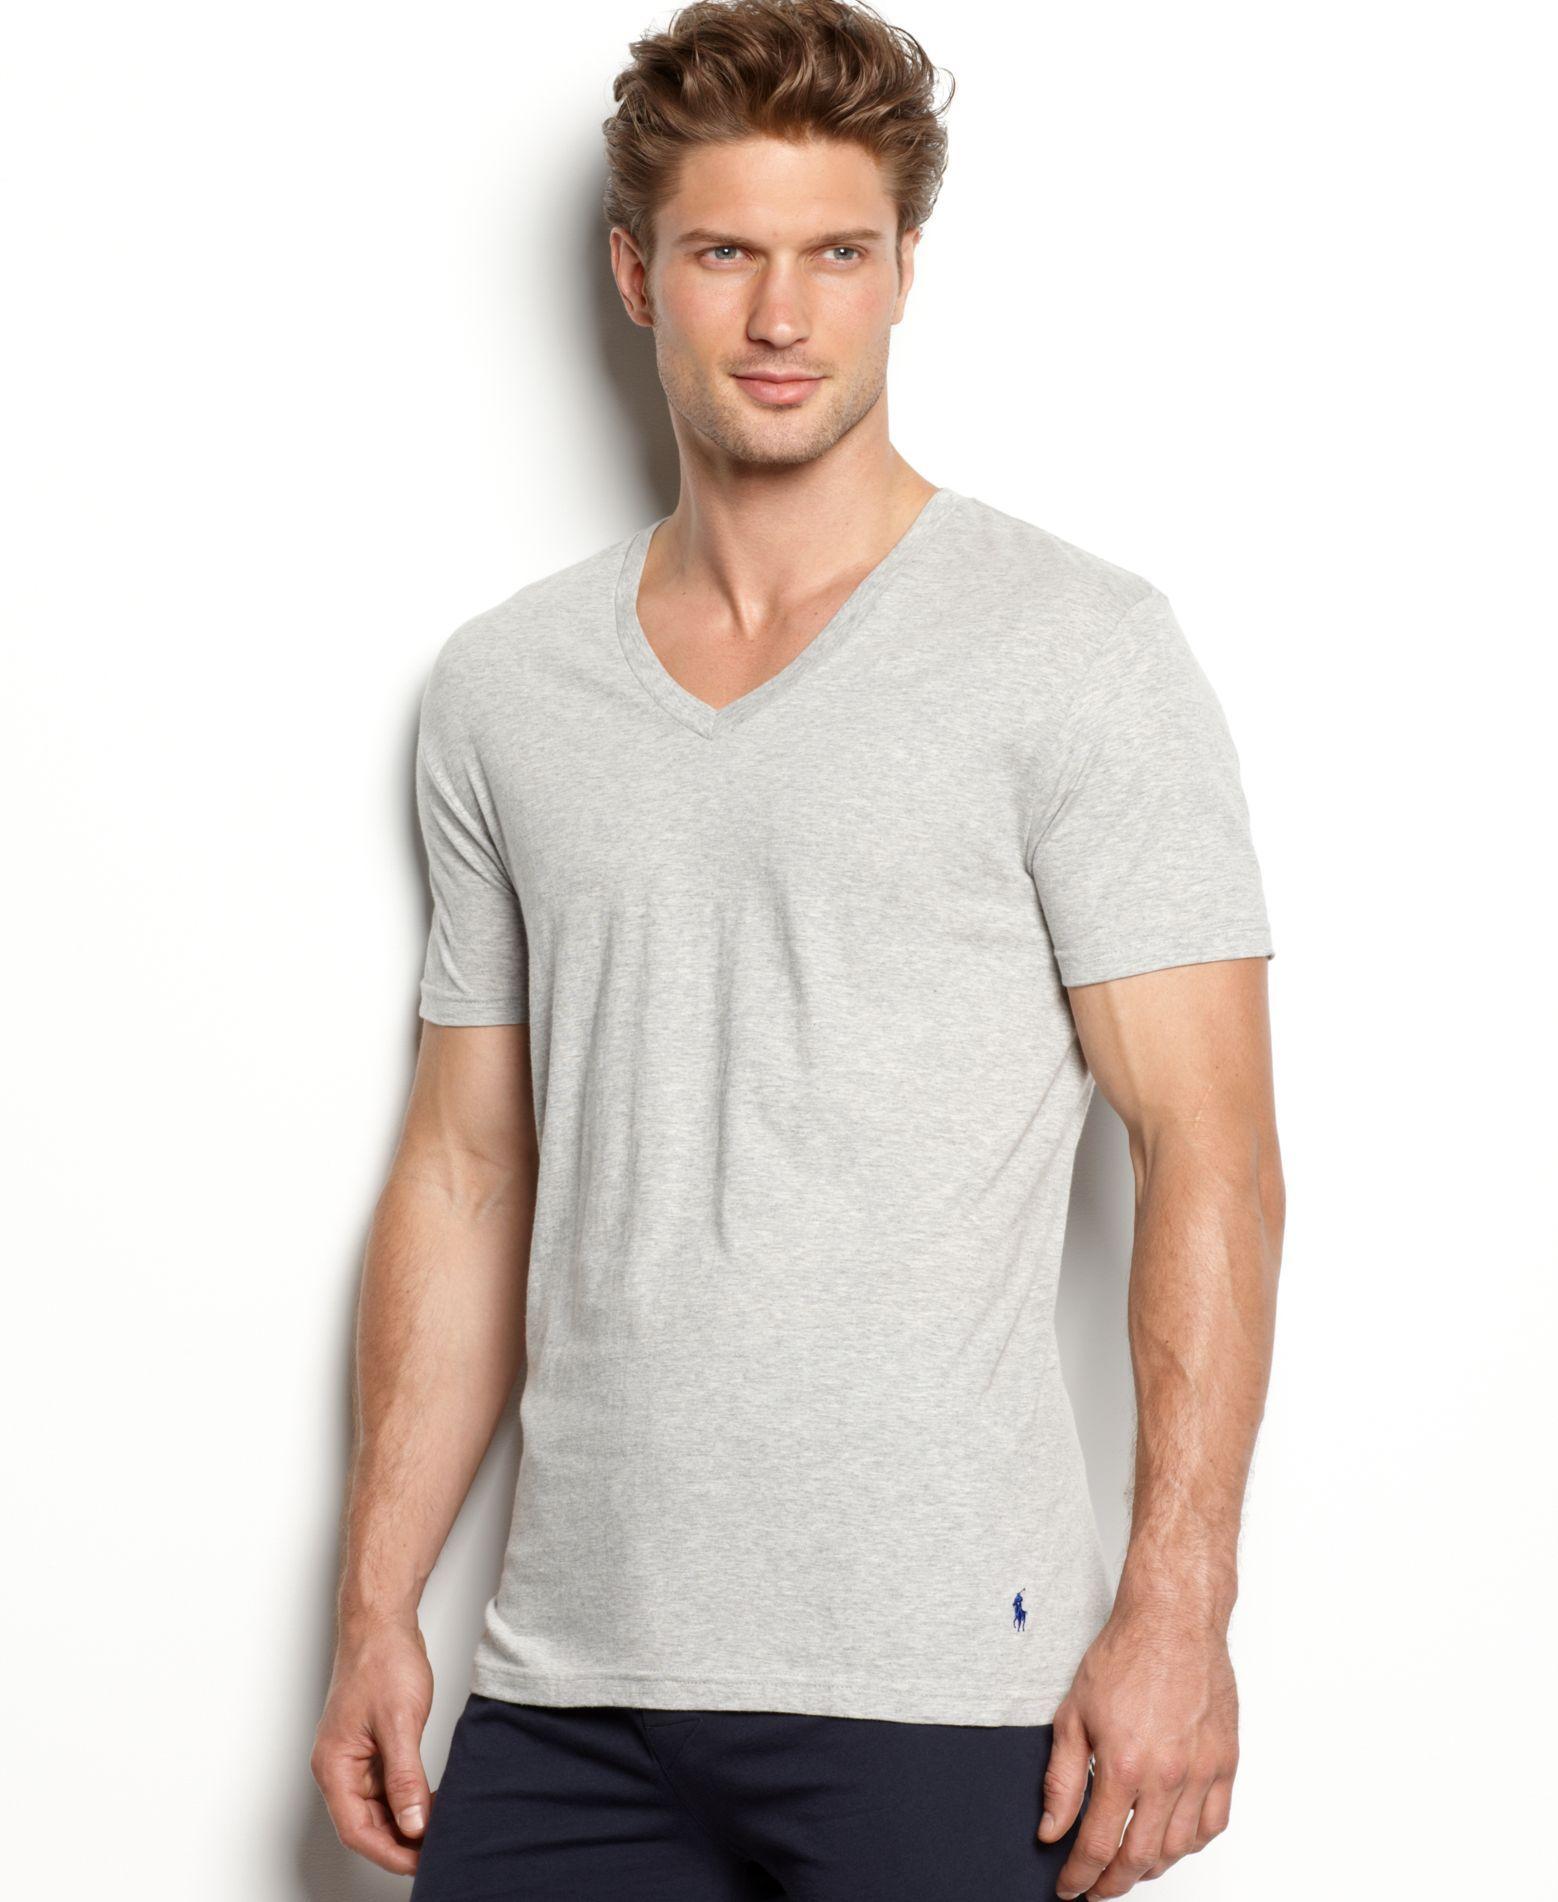 b49477dd Men's Undershirt, Slim Fit Classic Cotton V-Neck 3 Pack   Products ...